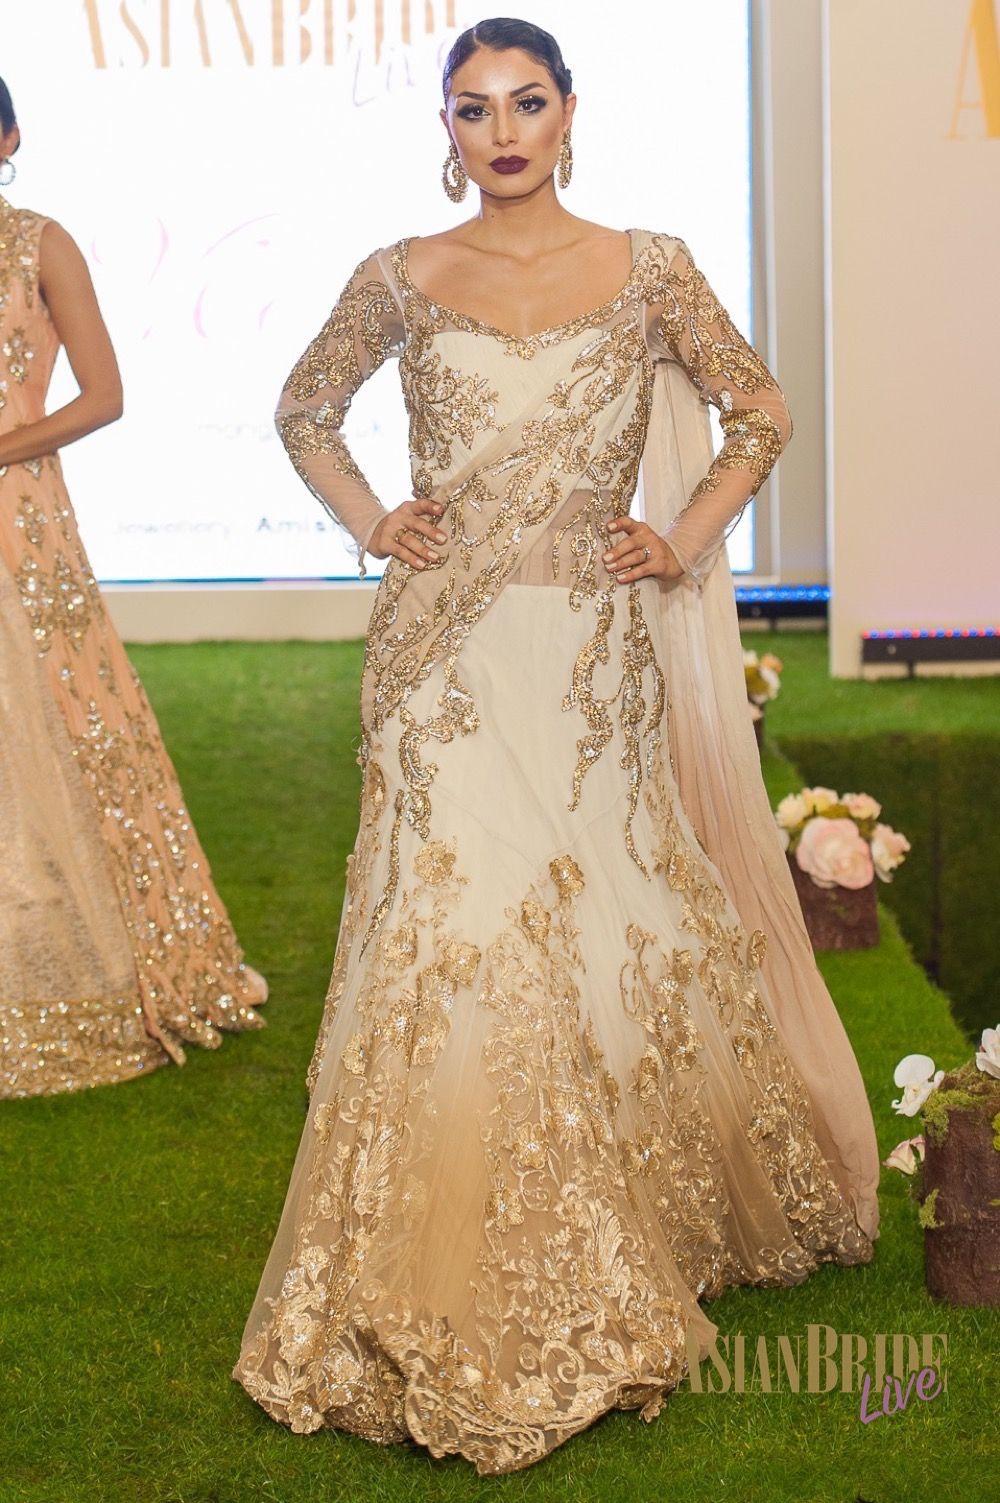 333b3a4eff Gold White embroidered Bridal lengha dress  Mongas-INDIAN-PAKISTANI-WEDDING-FASHION